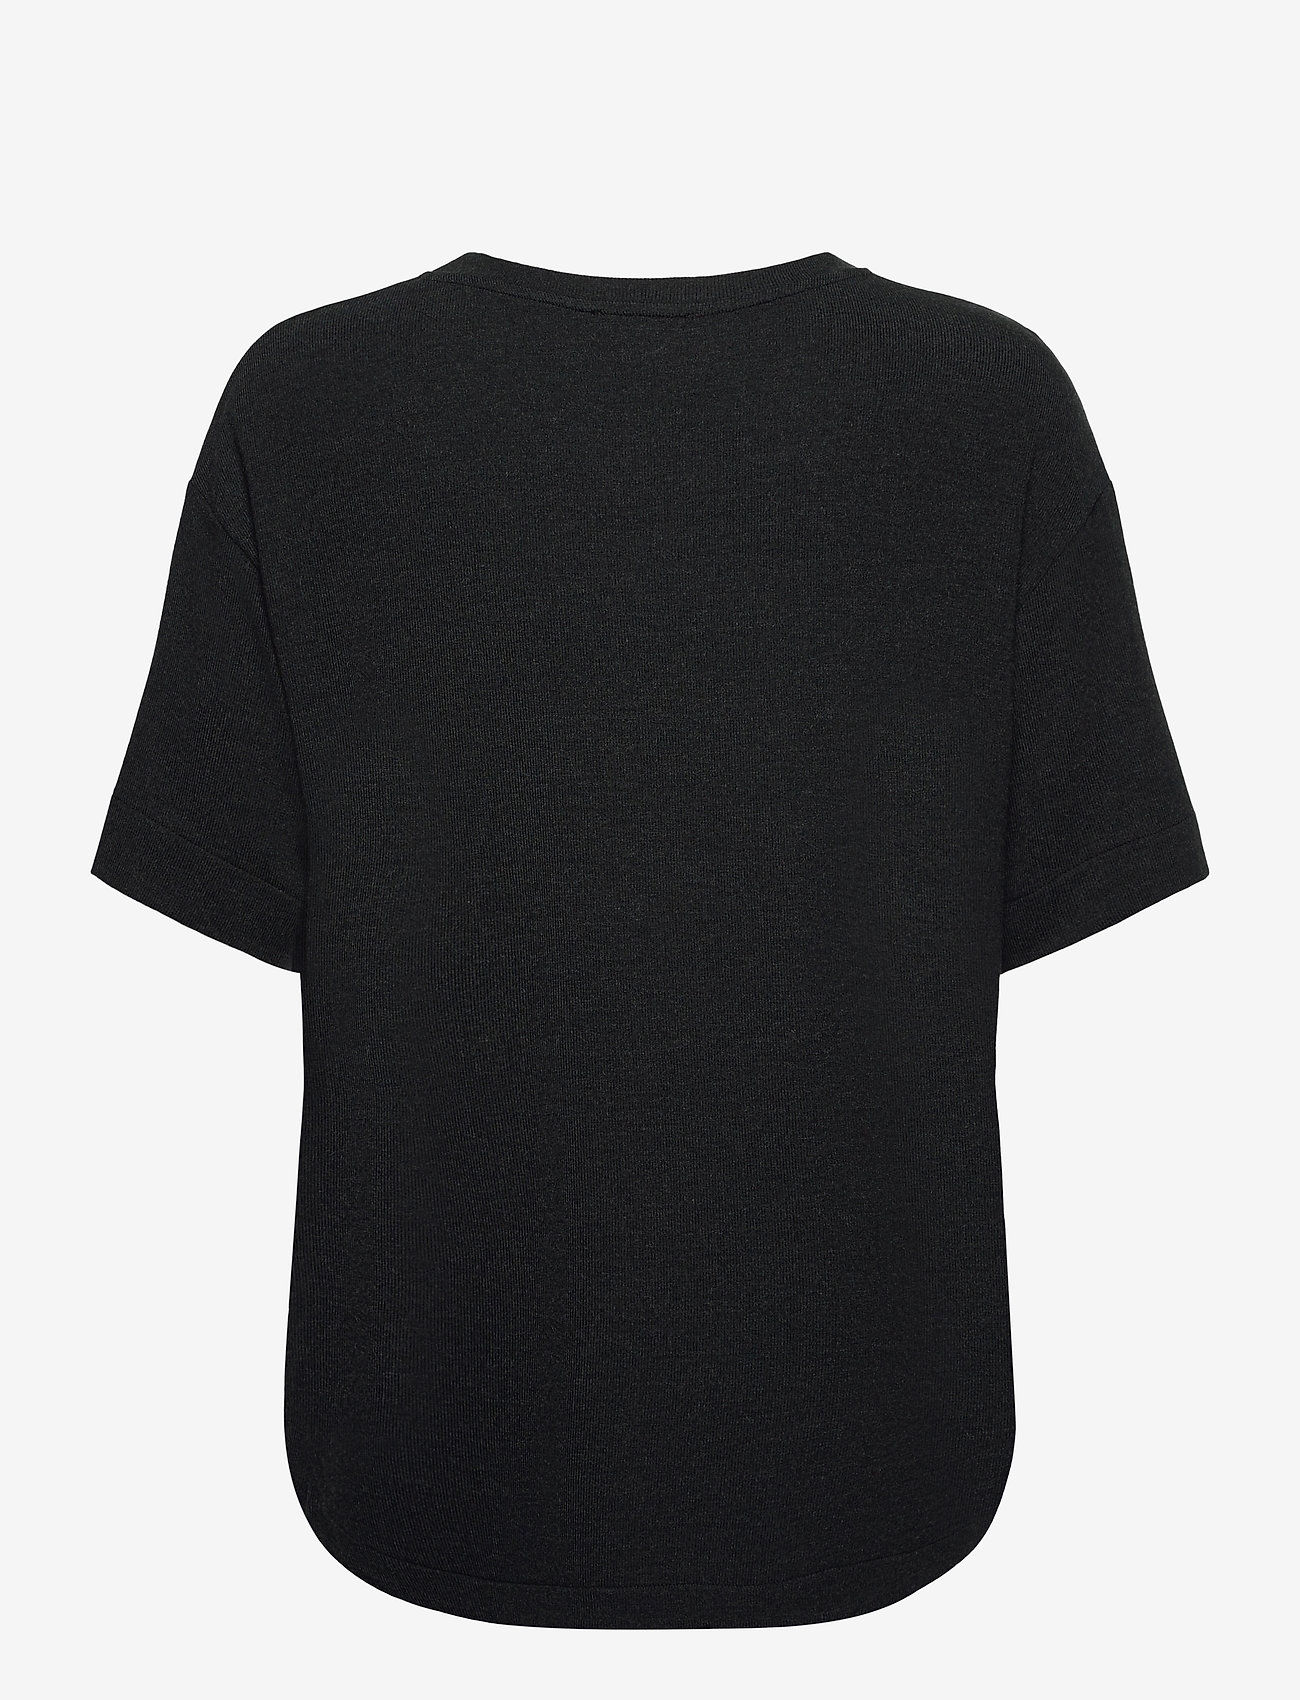 Esprit Casual - T-Shirts - t-shirts - black 4 - 1